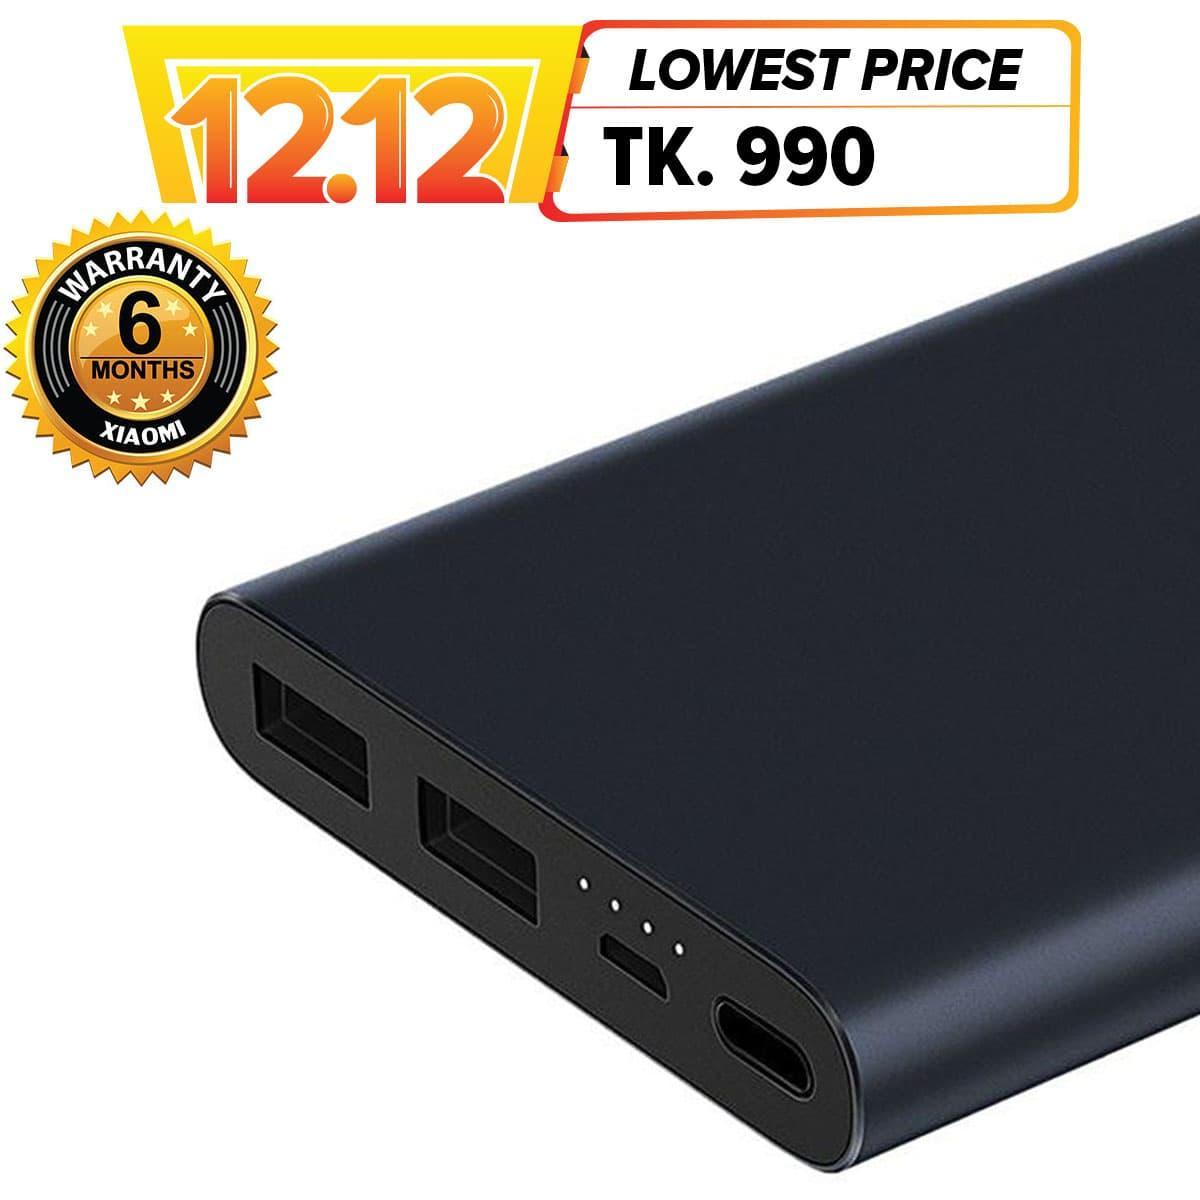 Power Bank Price In Bangladesh Mobile At Oldi Powerbank 12000mah Mi 10000mah 2s Dual Output Global Version Black